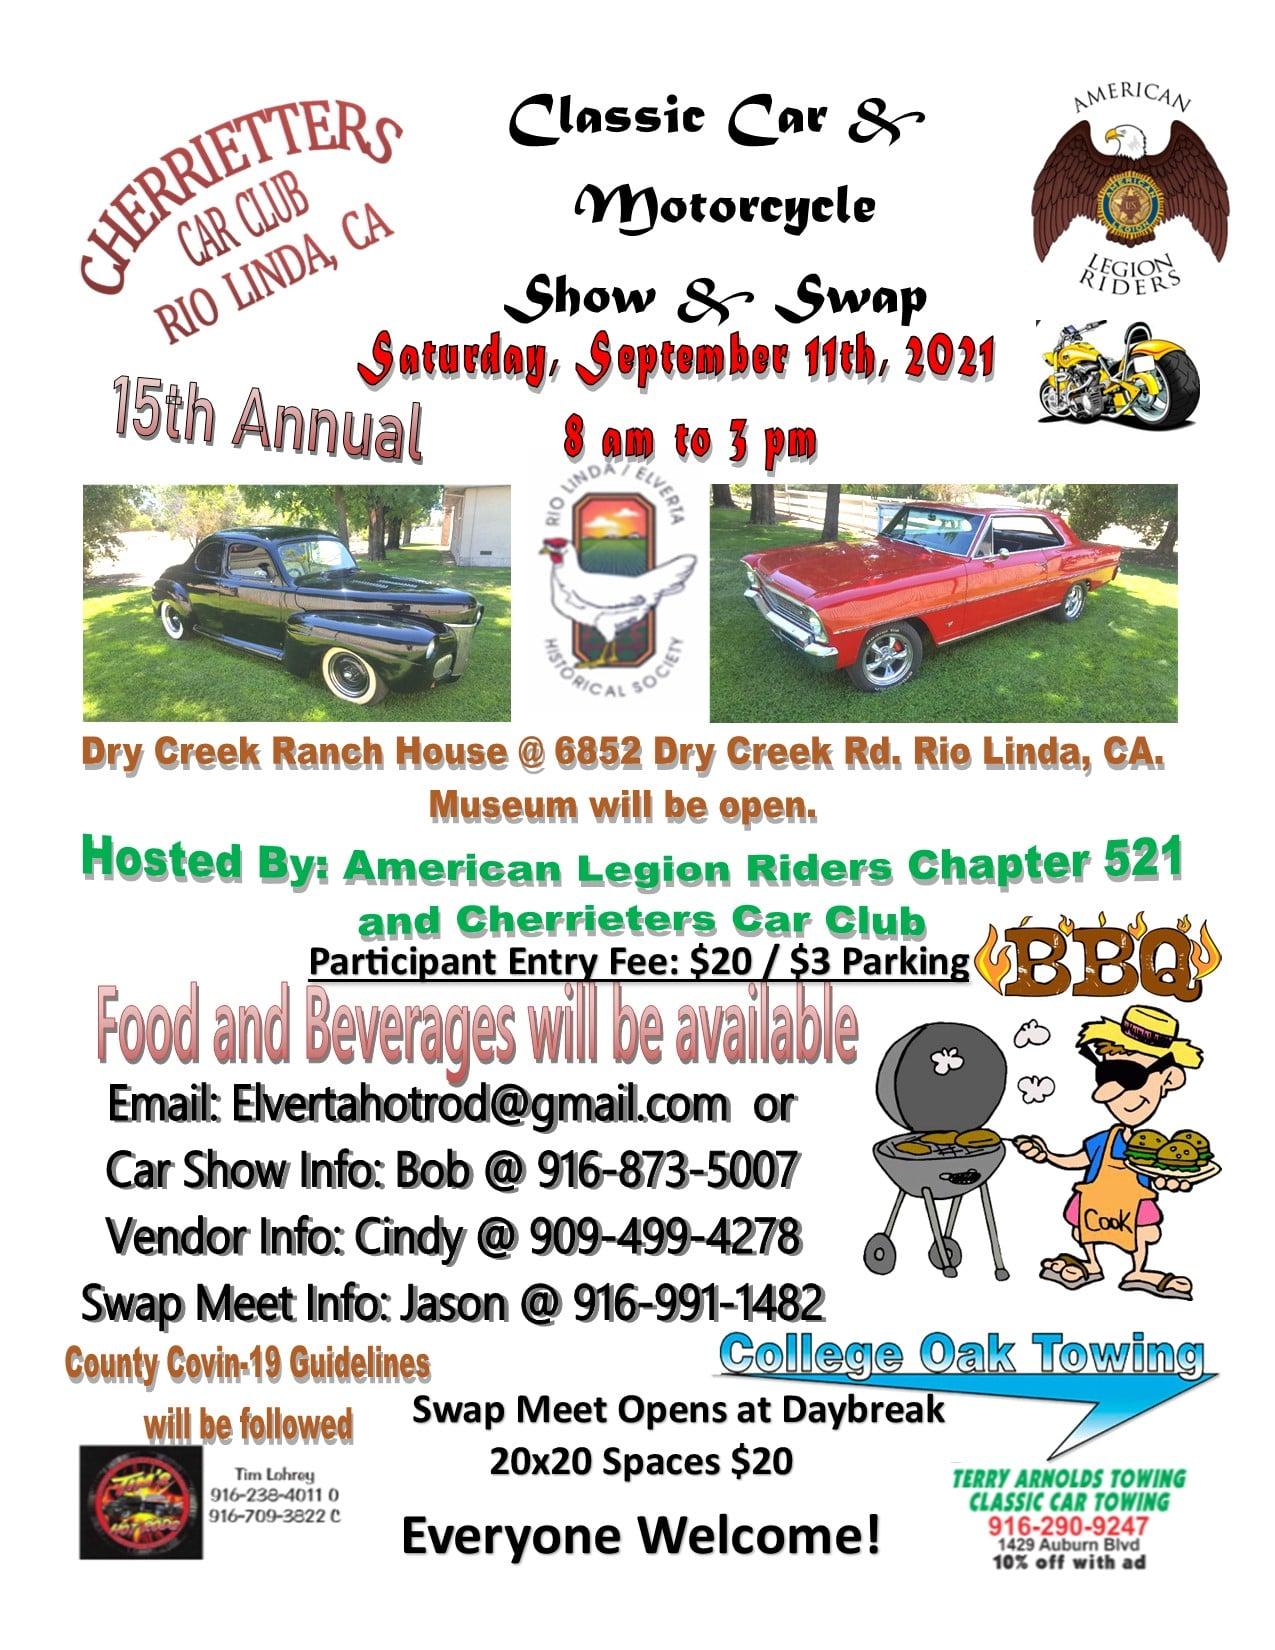 Cherrietters Classic Car & Motorcycle Show & Swap